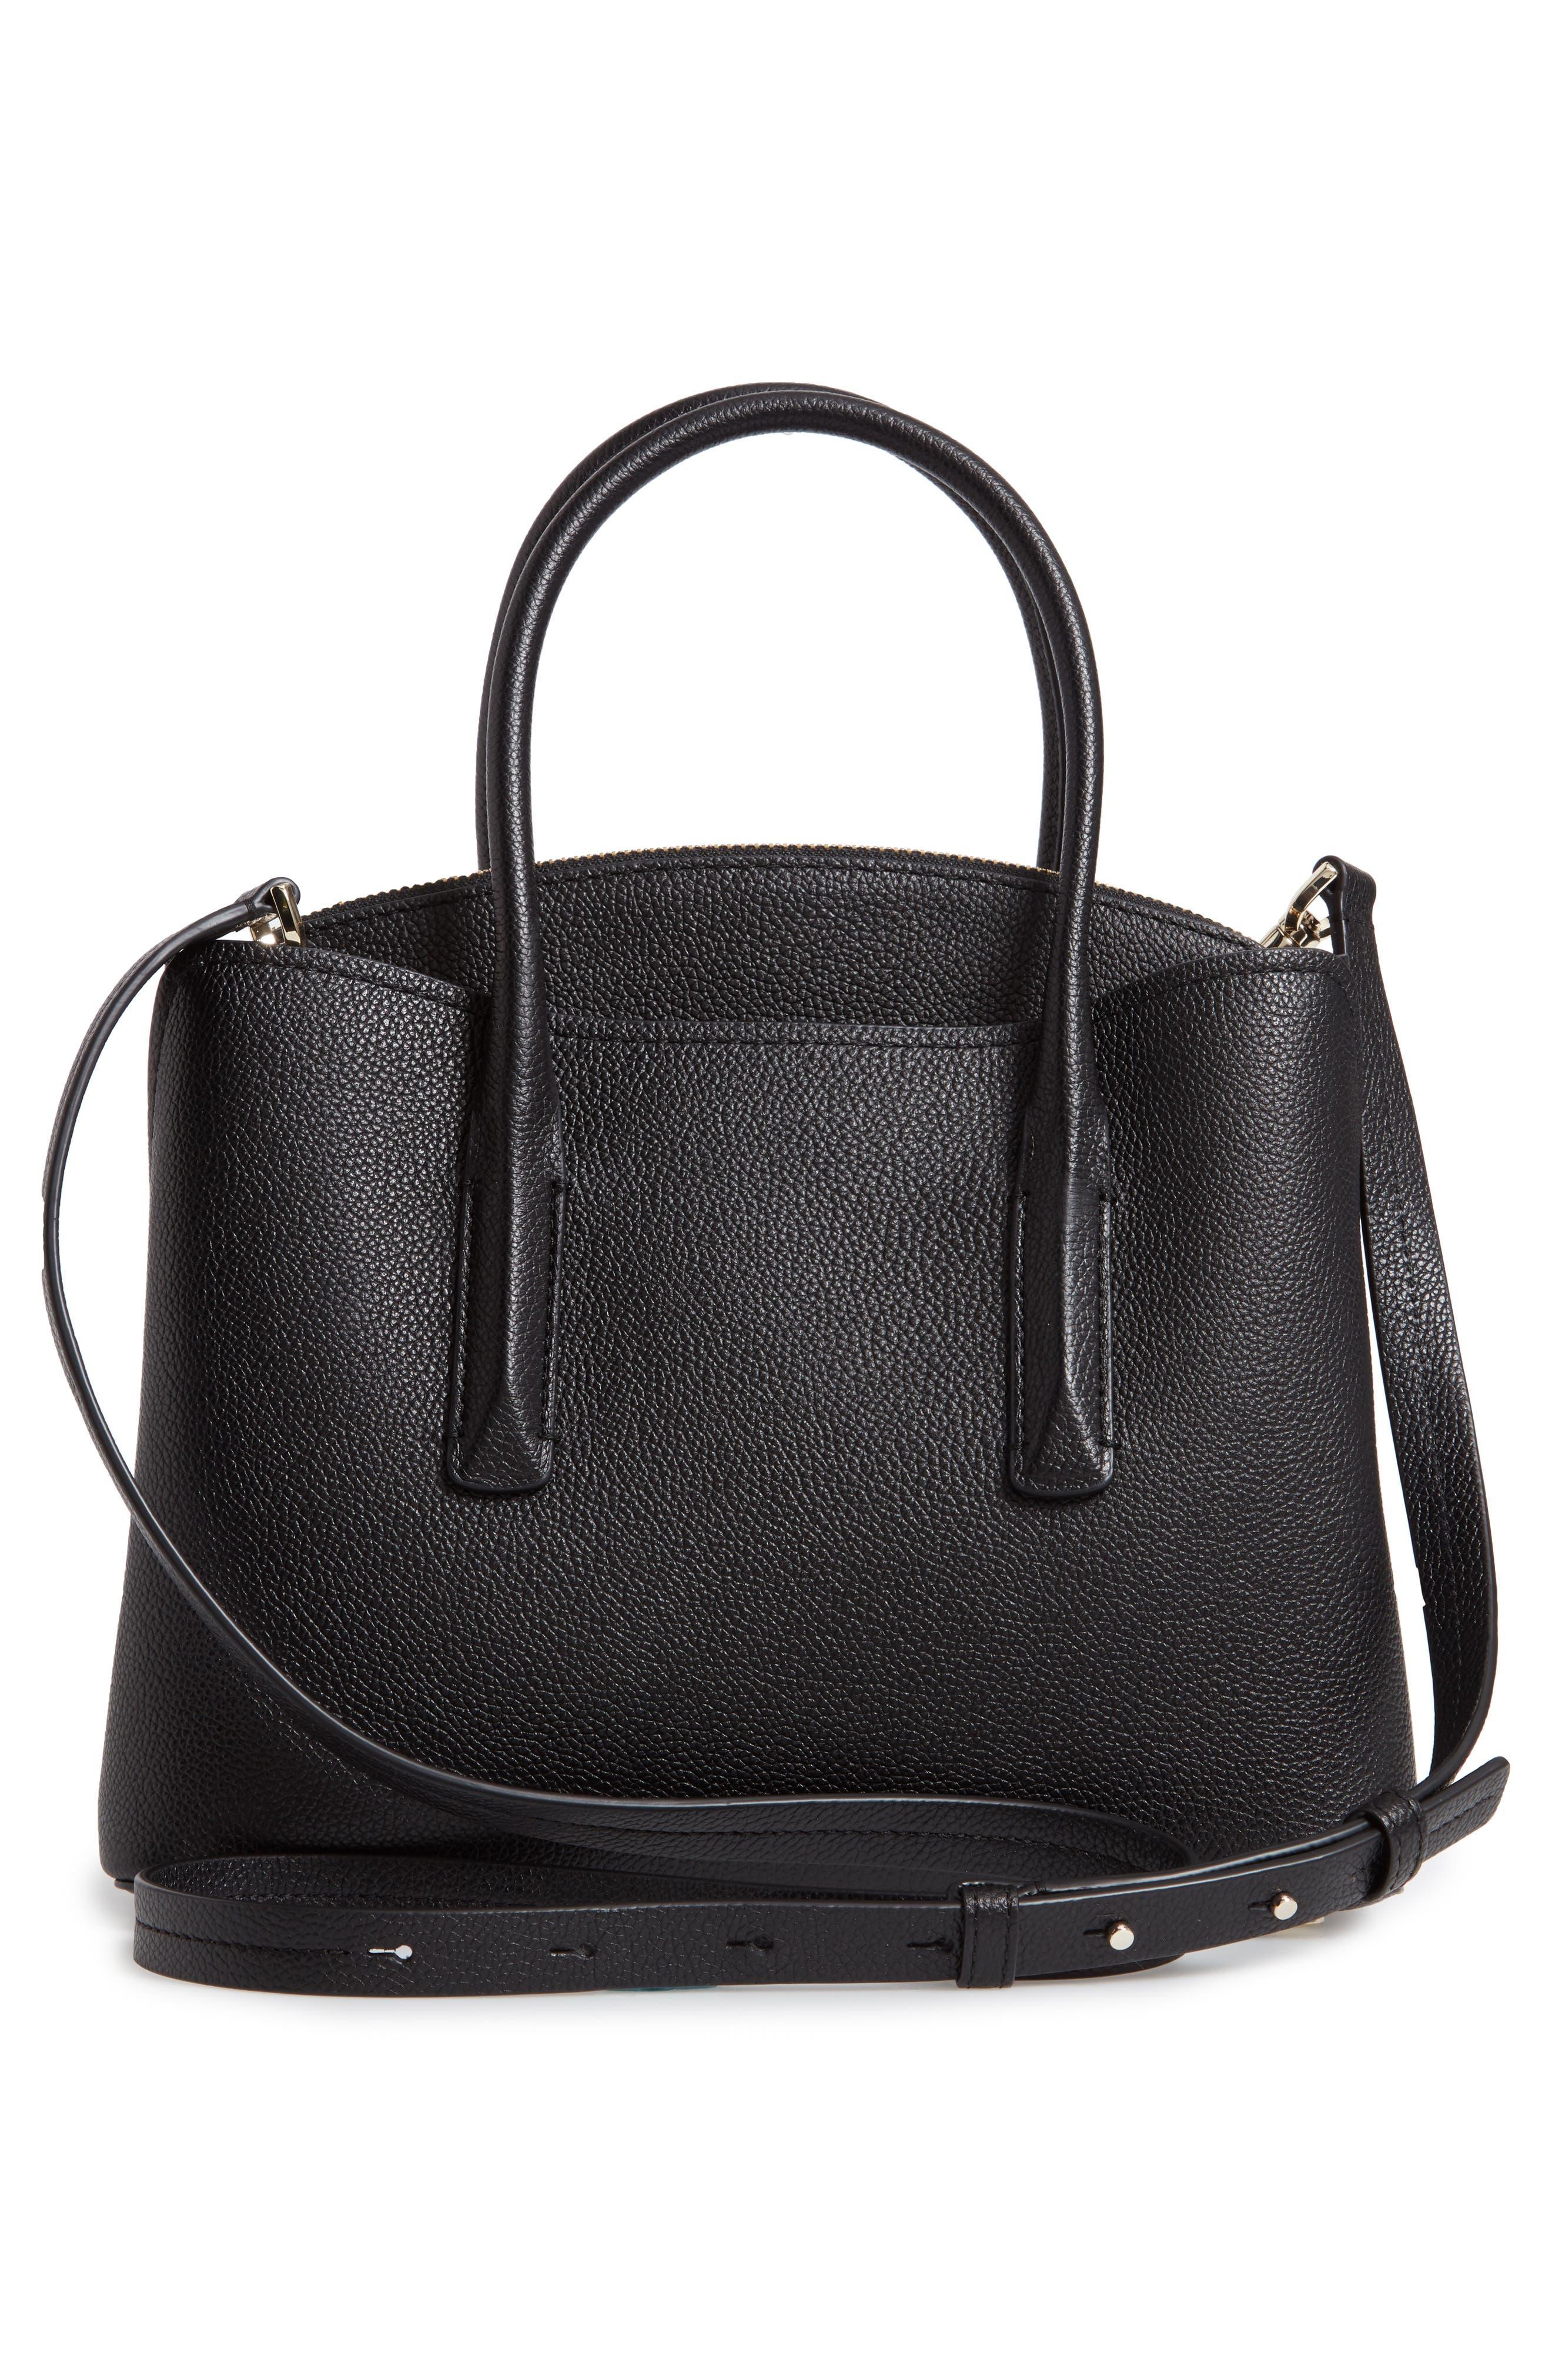 KATE SPADE NEW YORK, medium margaux leather satchel, Alternate thumbnail 4, color, BLACK